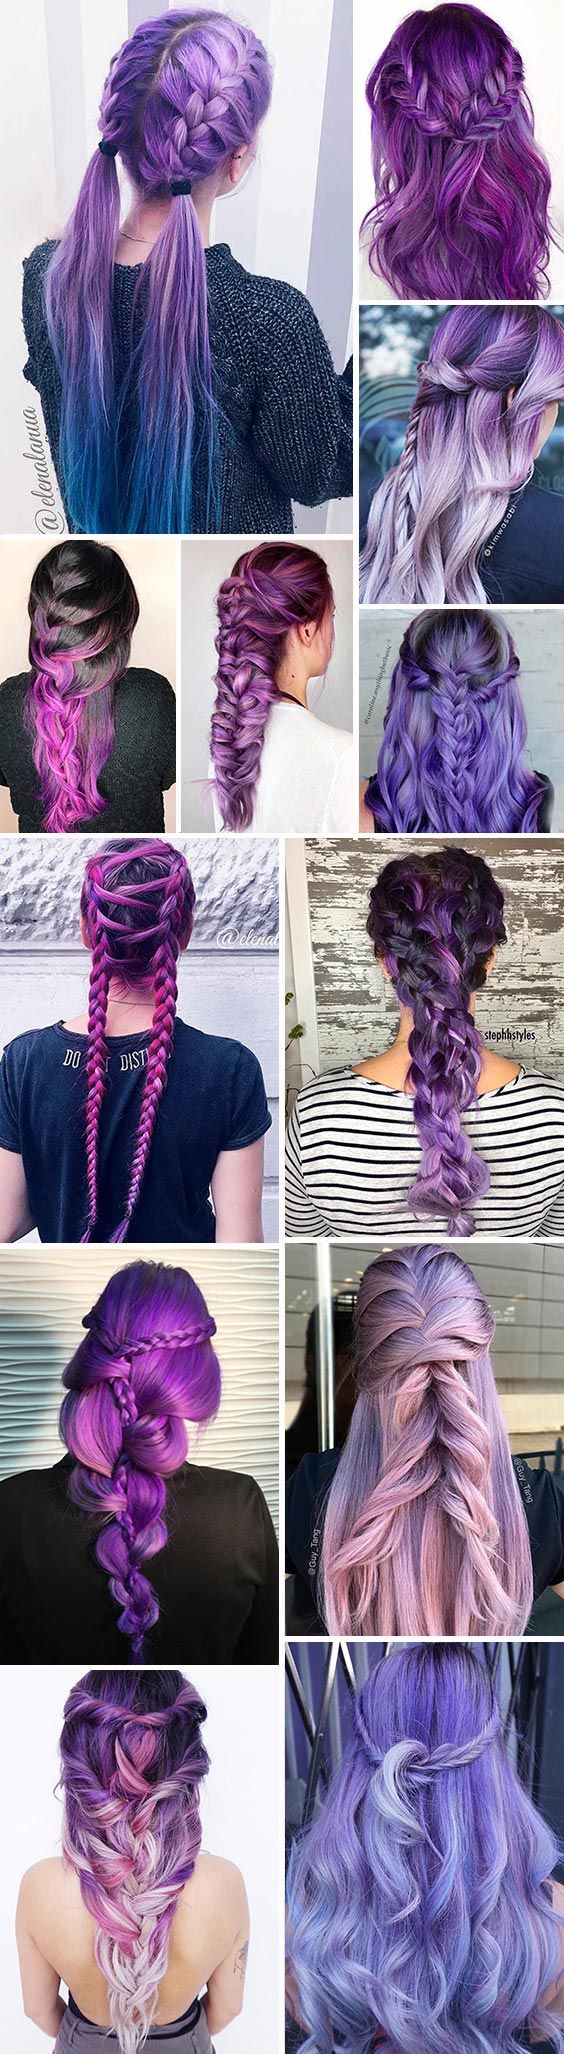 inspirational ideas to braid your purple hair purple hair